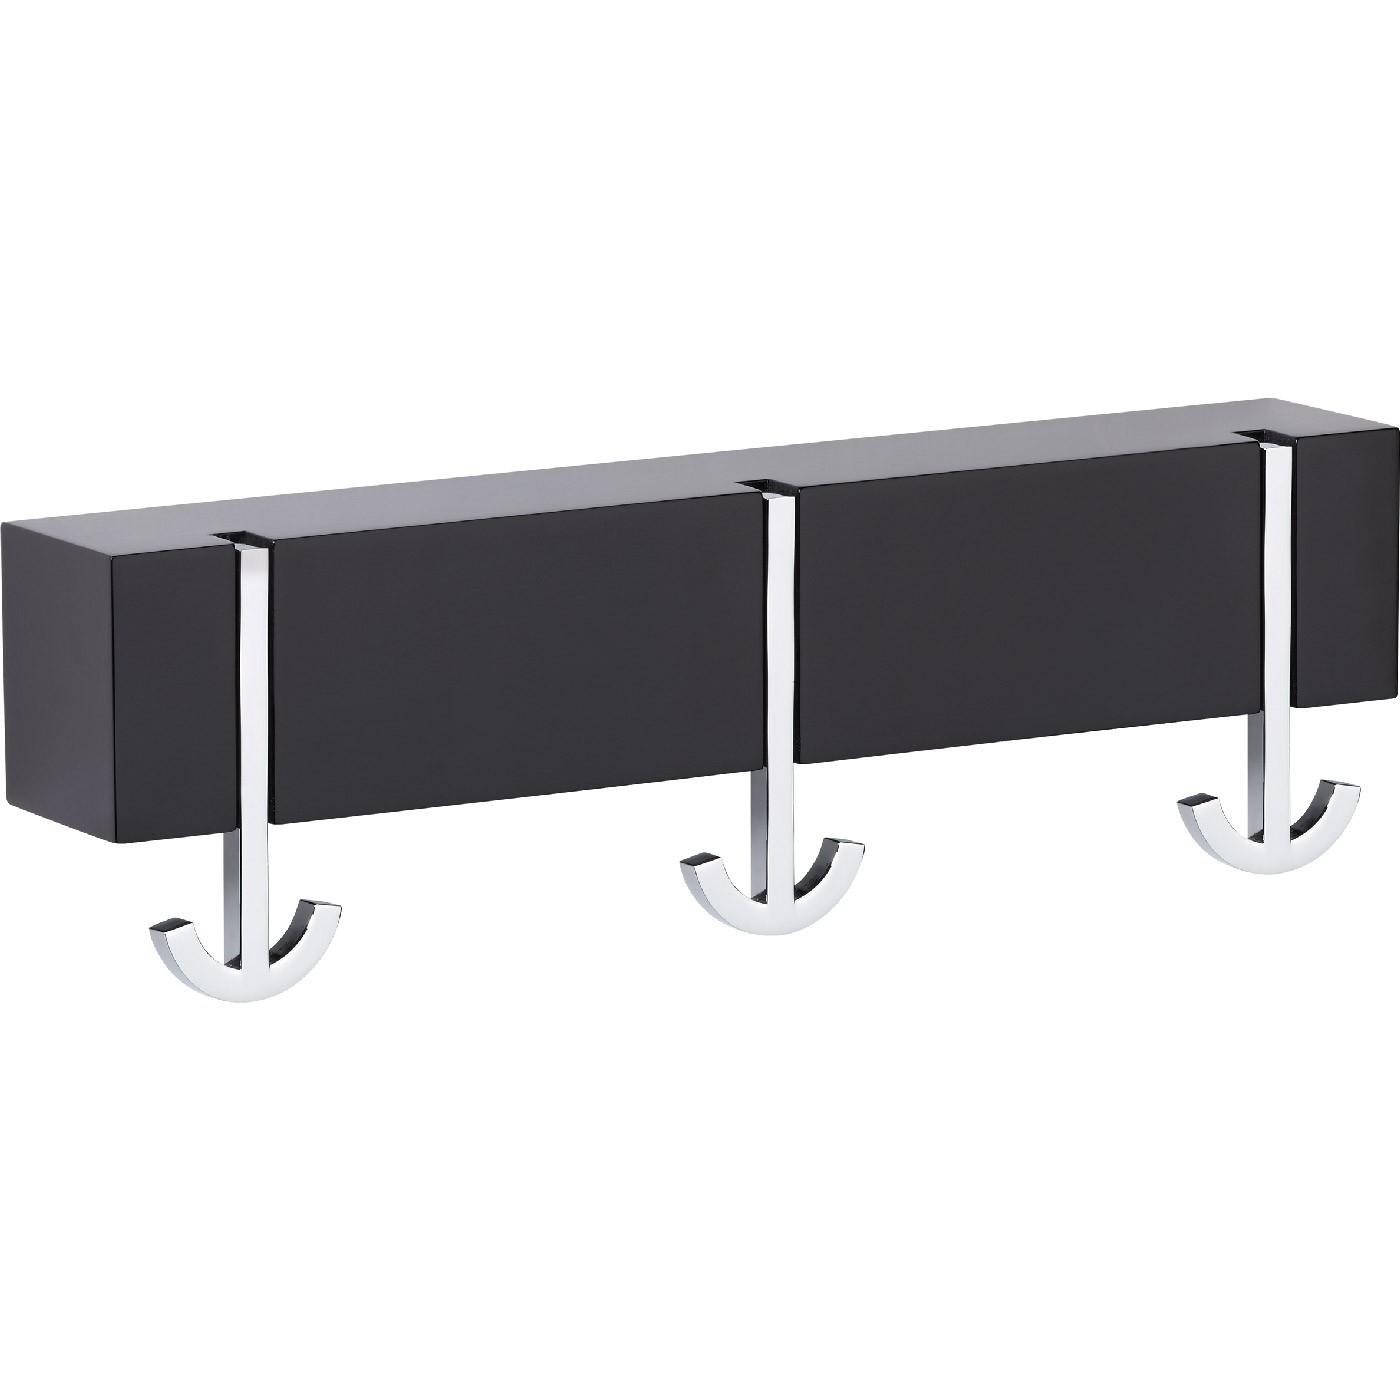 wandgarderobe pieperconcept ancora tre schwarz. Black Bedroom Furniture Sets. Home Design Ideas